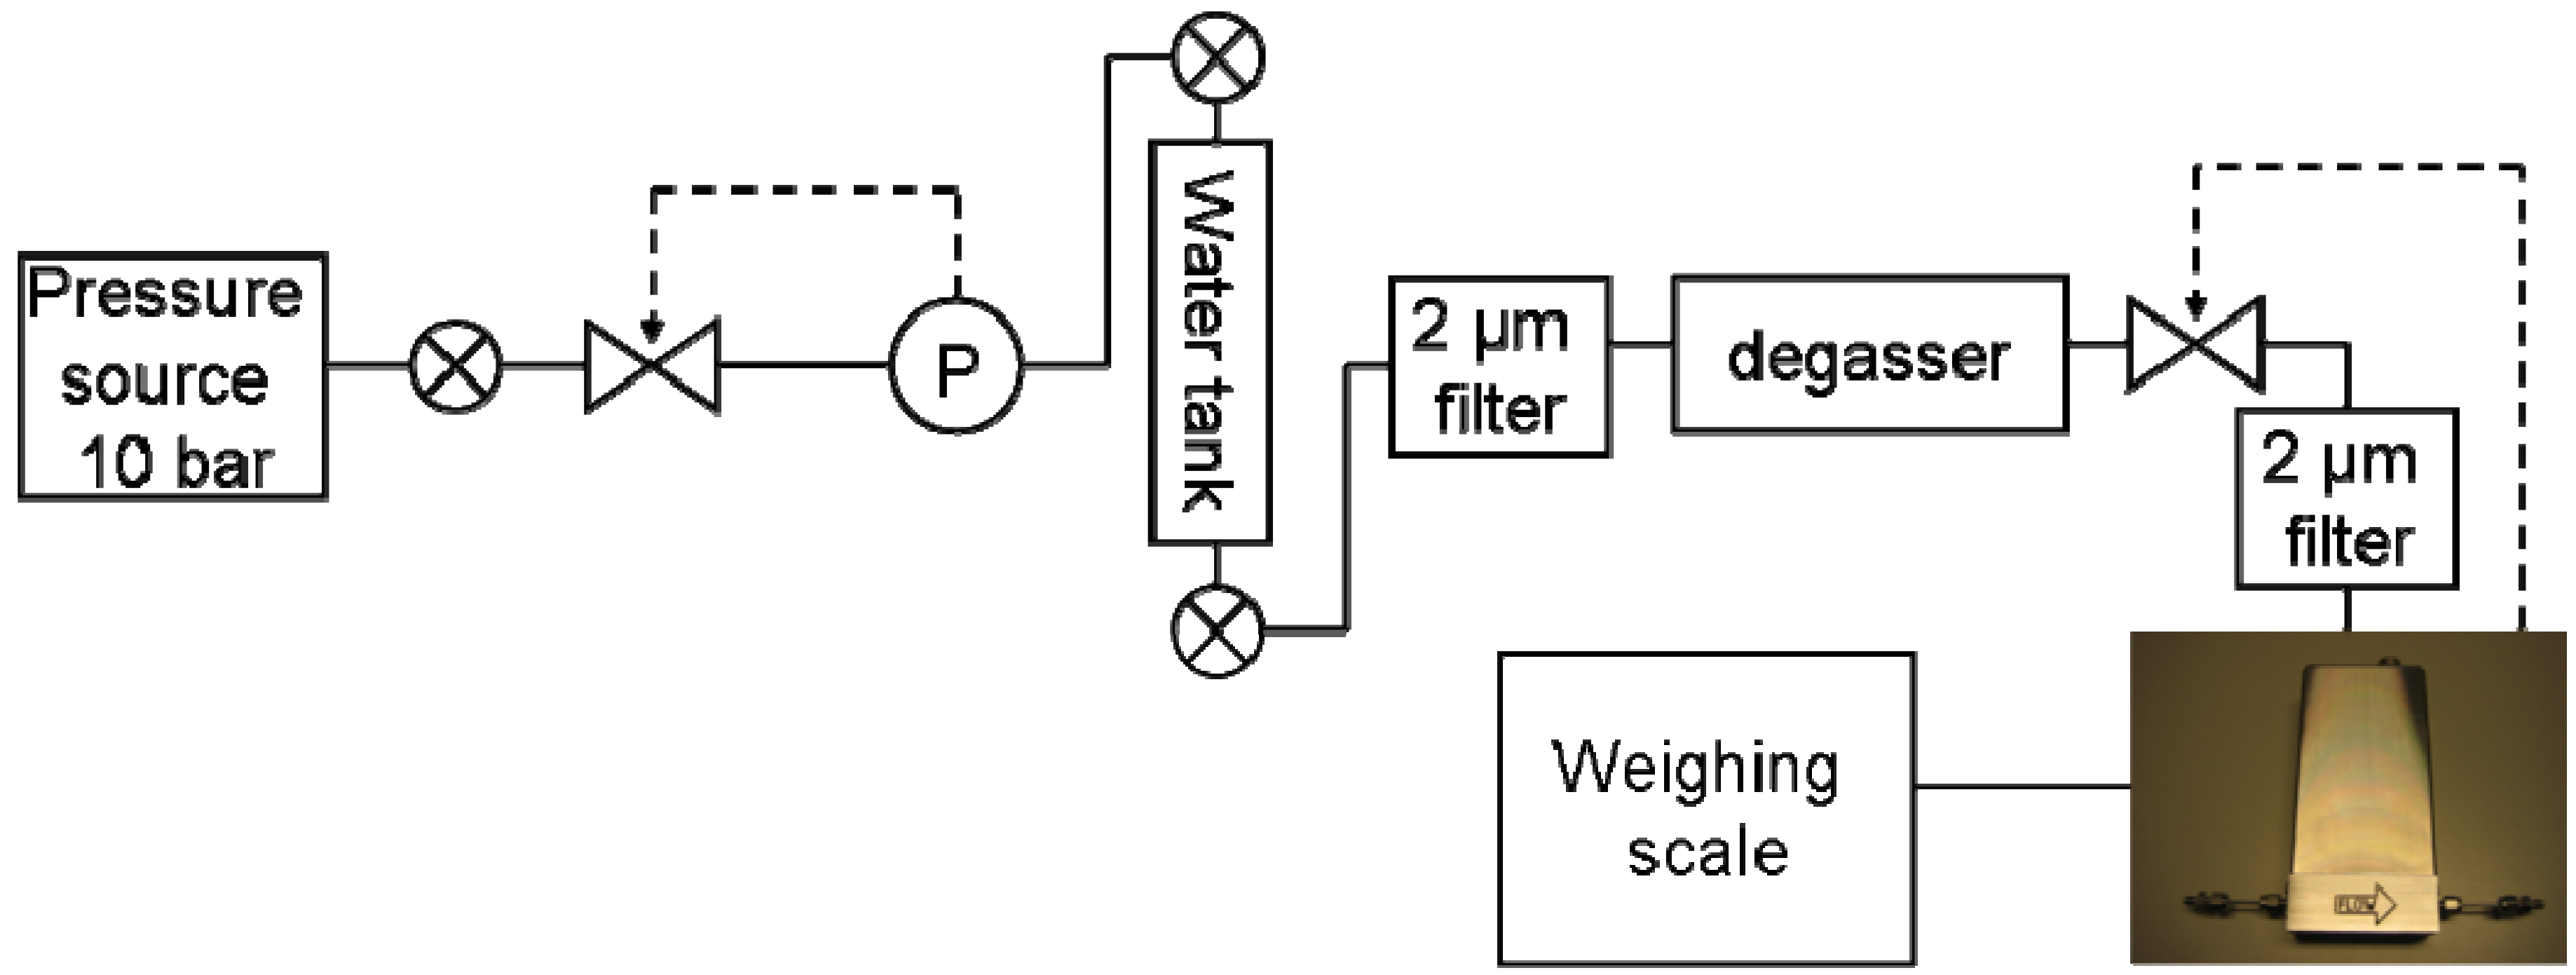 trane rthb 255 chiller manual